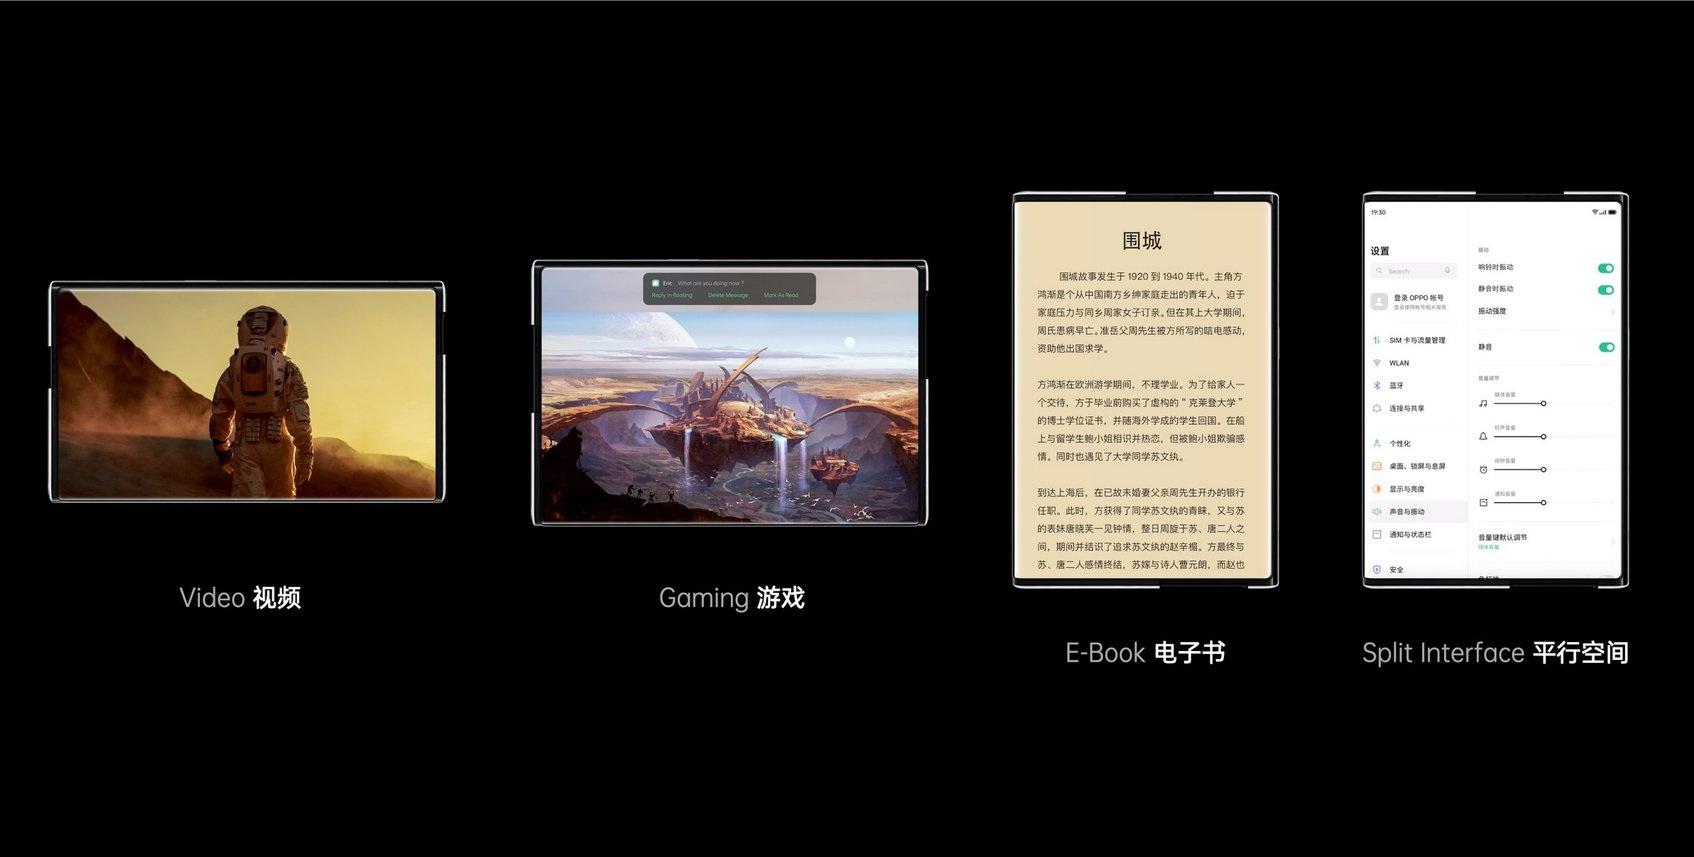 Анонс OPPO X 2021. Концепт-смартфон с необычным экраном Другие устройства  - oppo_inno_day_picture6_0